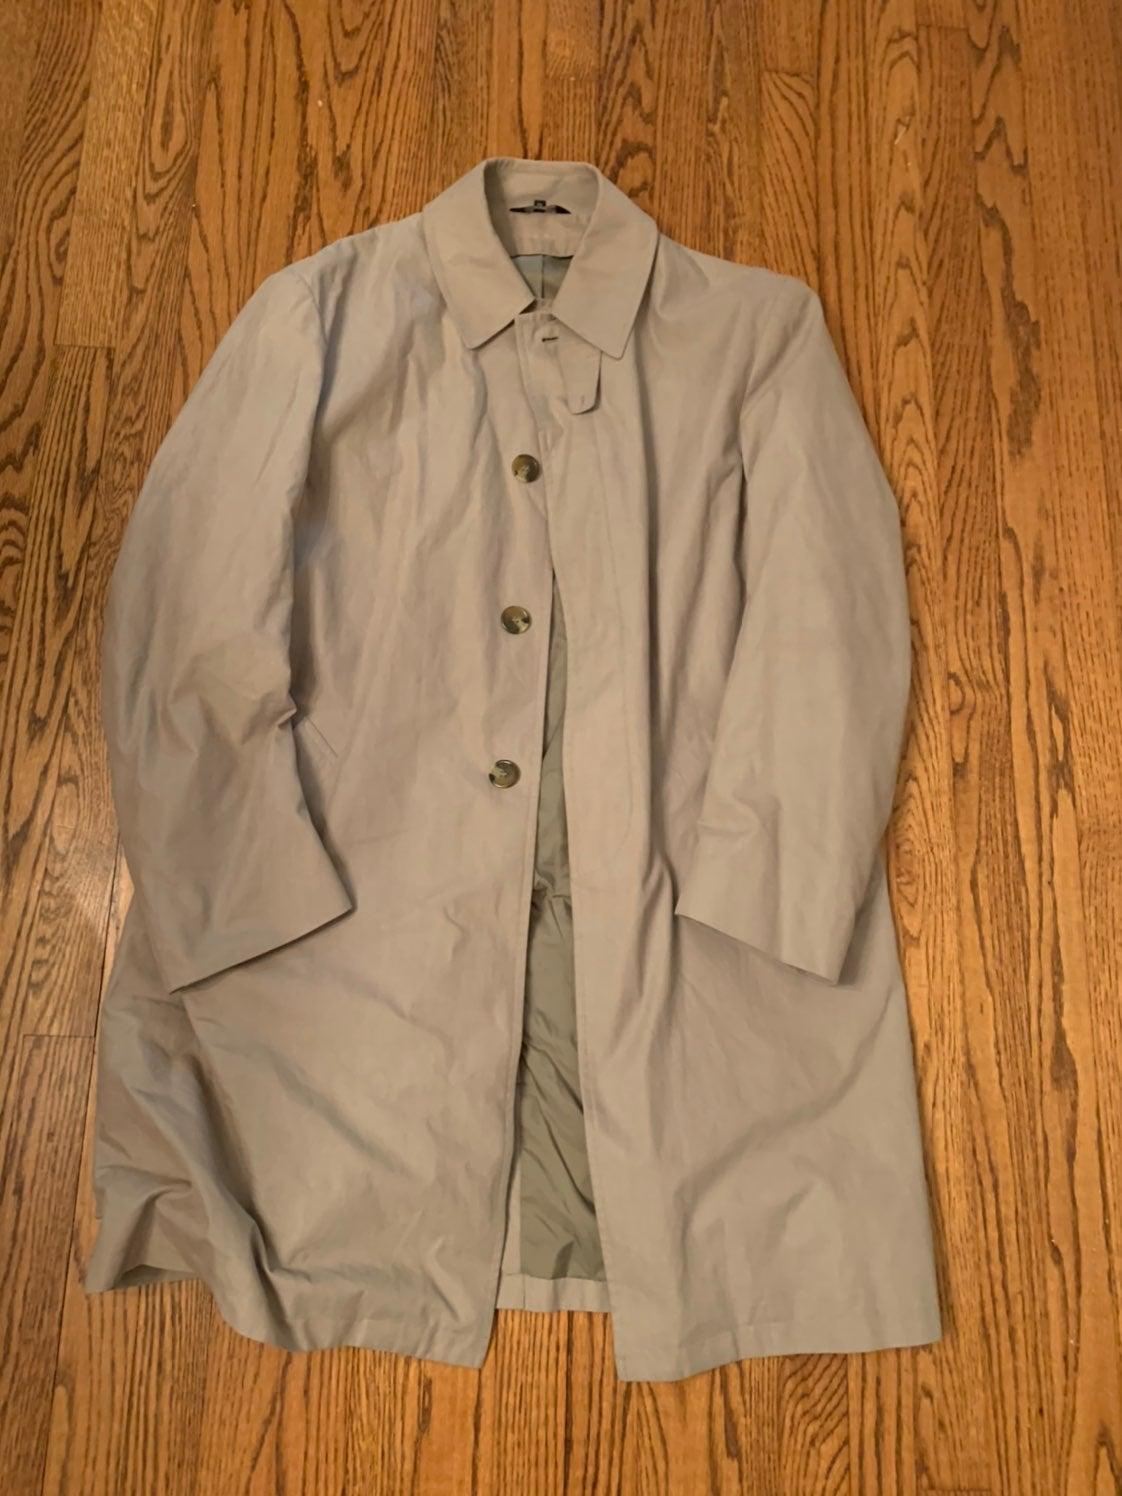 Trench (Rain) Coat